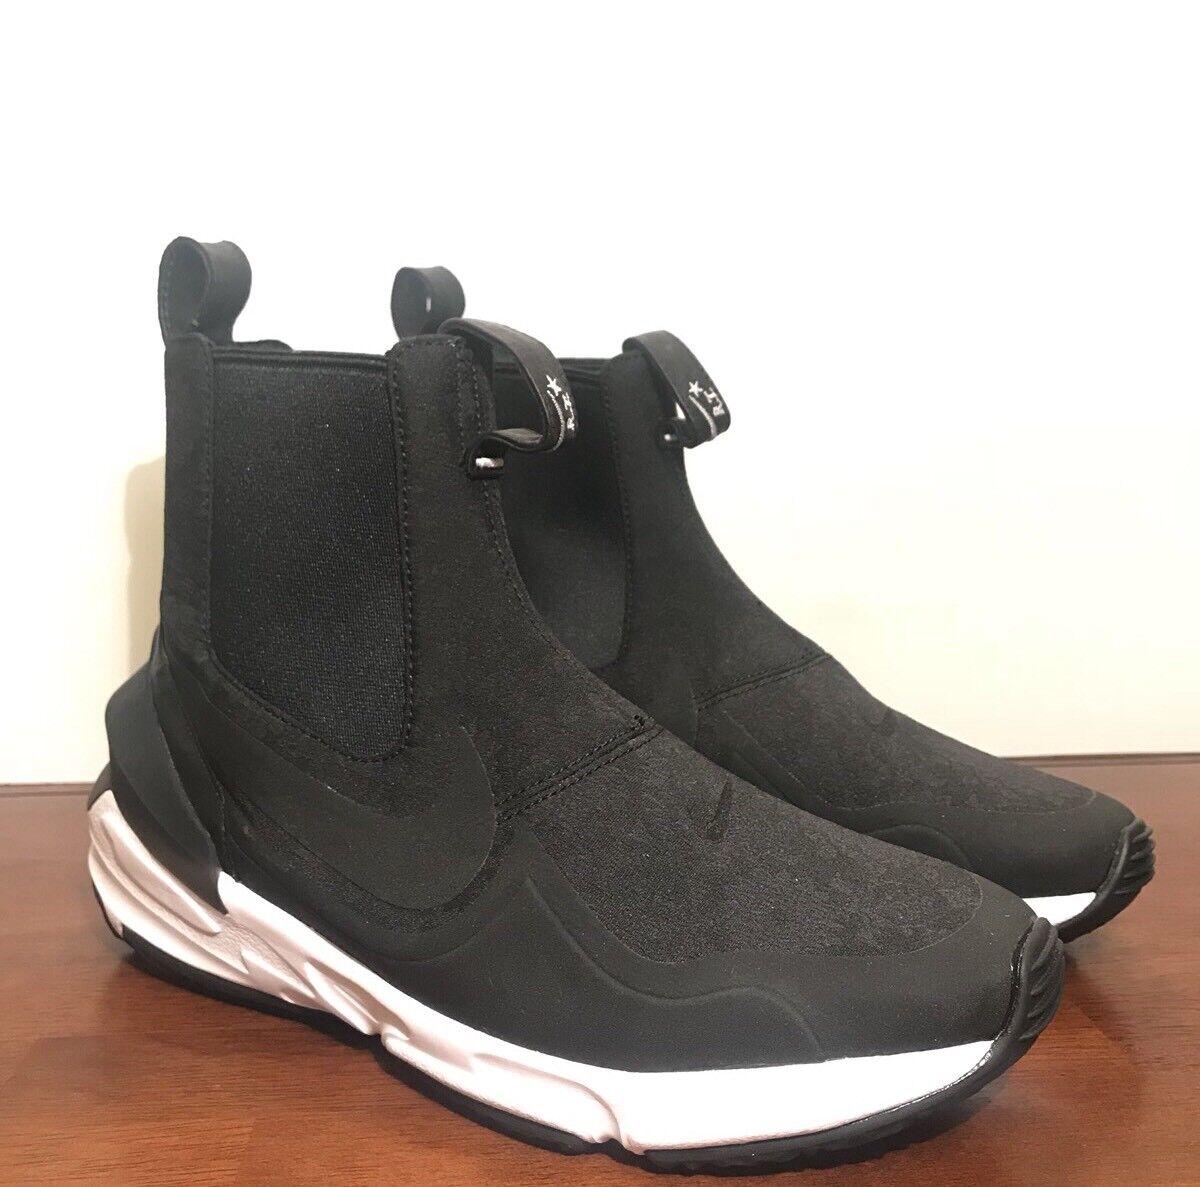 Nike NikeLab X riccardo Tisci Air Zoom Legend RT 908458-001 Mens US Size 6